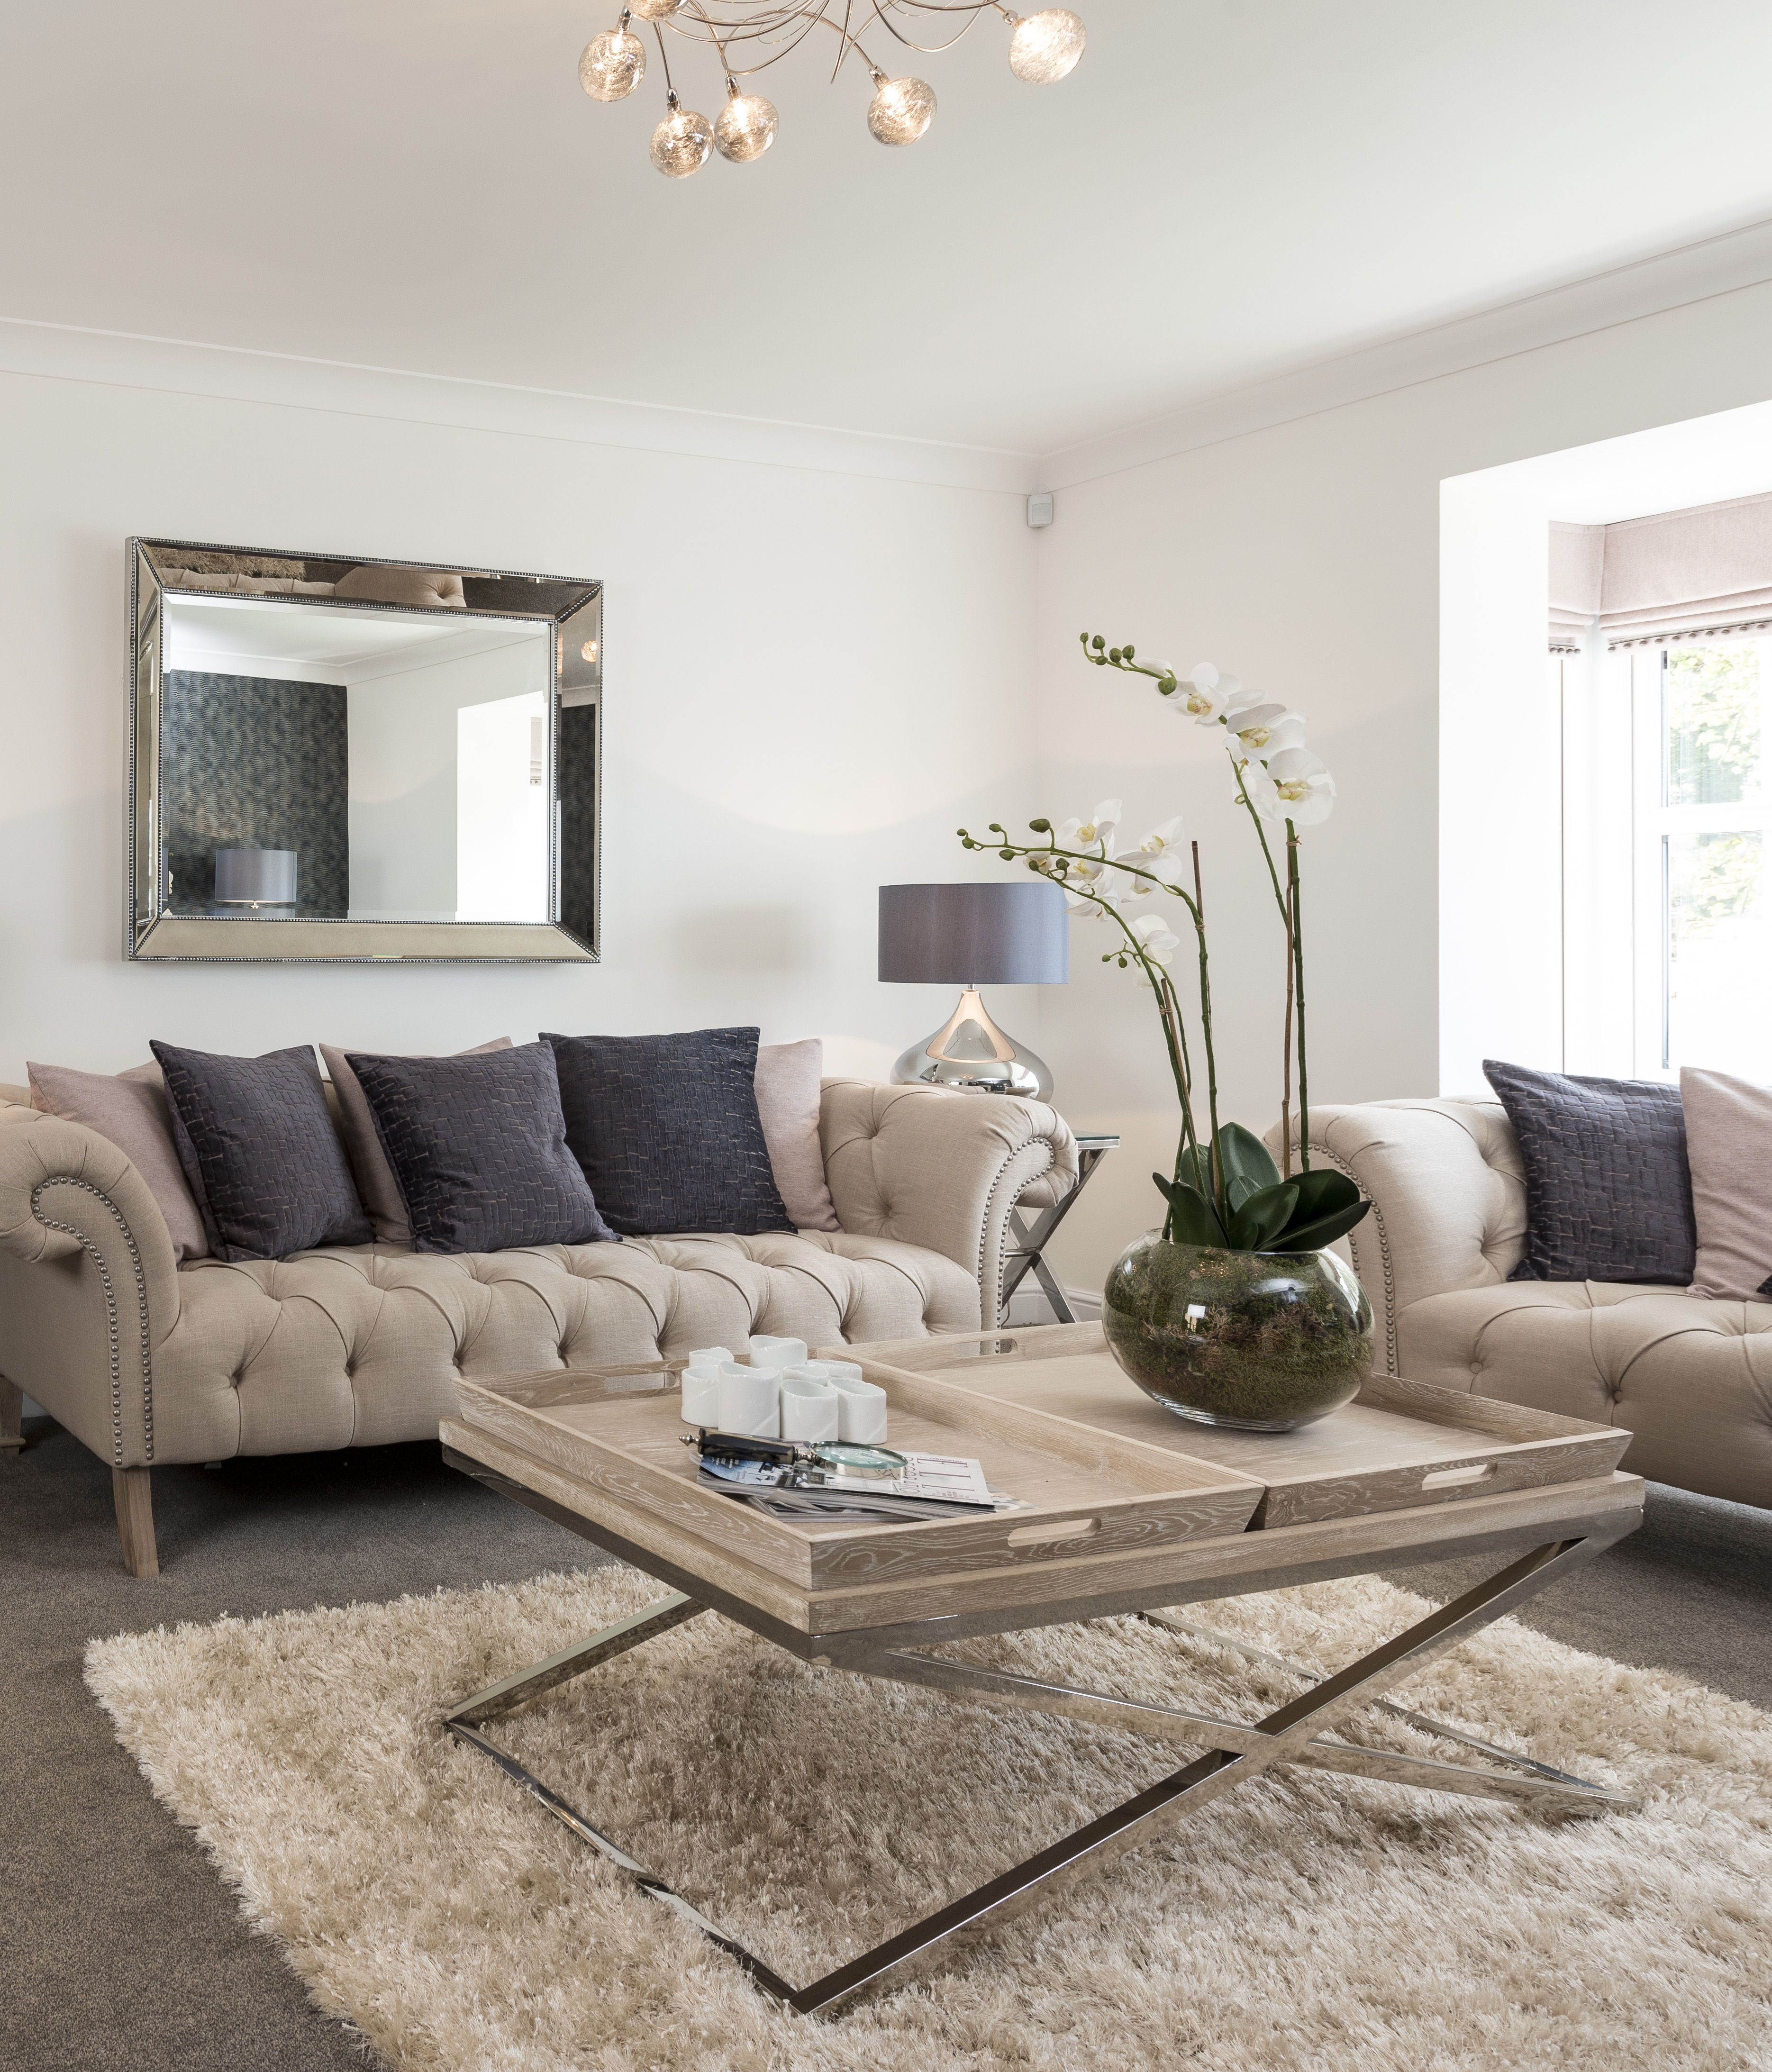 Tan Carpet And Gray Walls Google Search: Grey Carpet White Walls Coloured Sofa